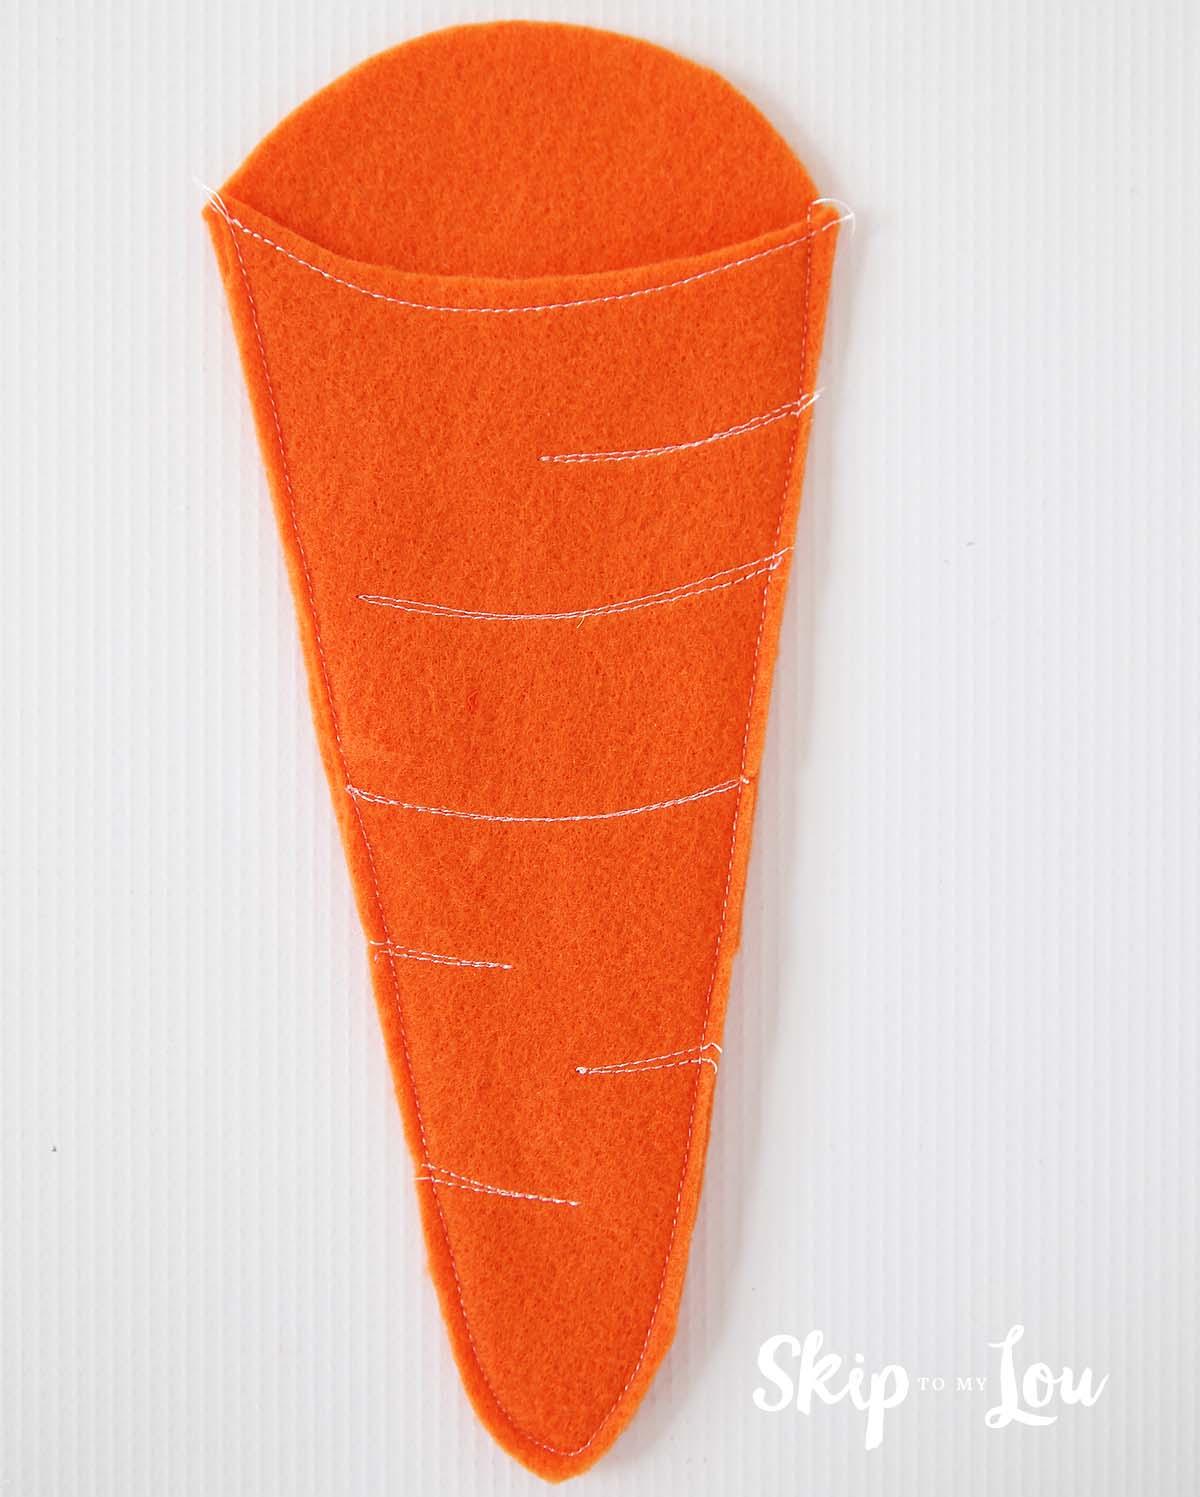 sewn felt carrot pencil holder